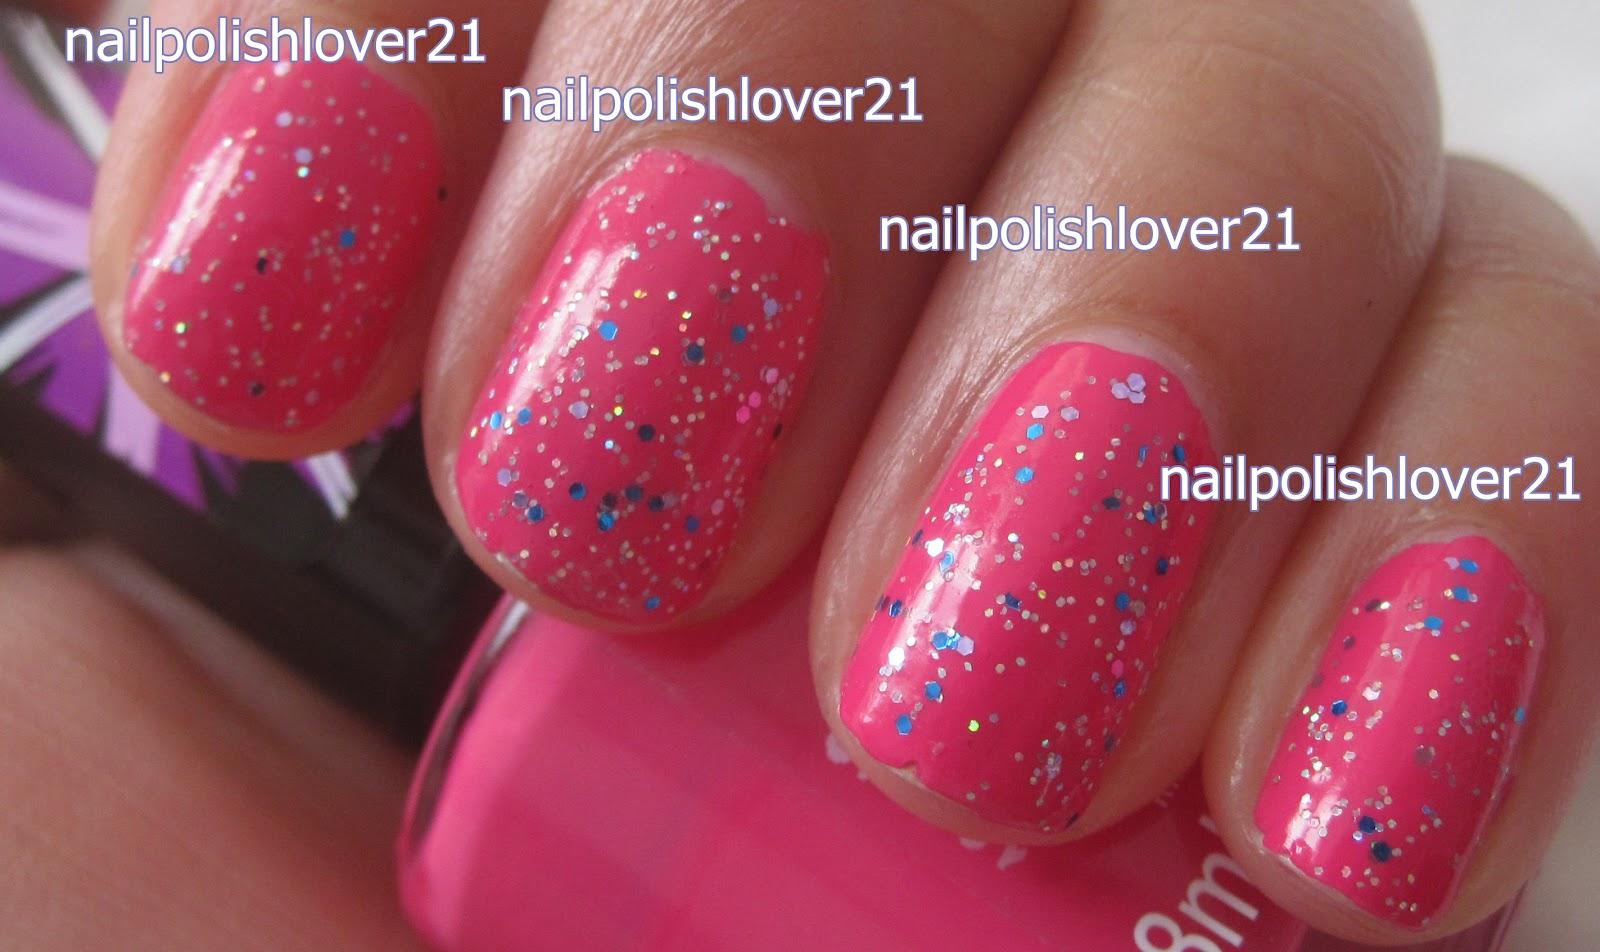 Hot Pink Glitter Nail Polish Finish Nail Polish in Hot